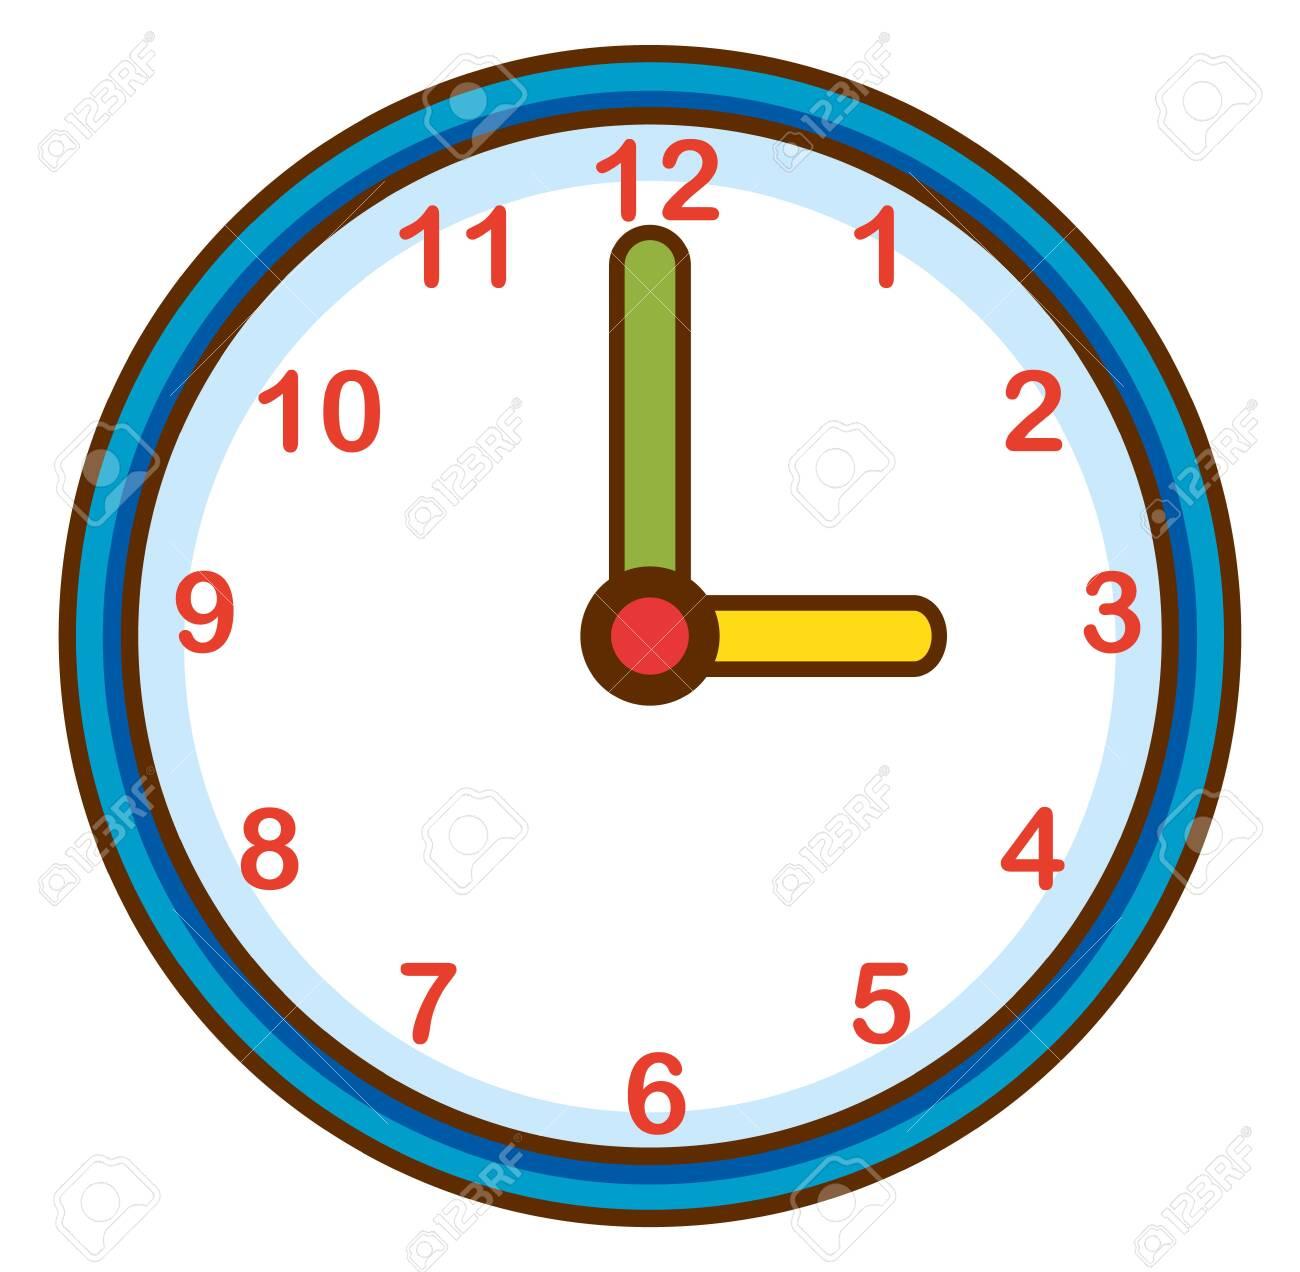 Wall clock on white background illustration - 133371475